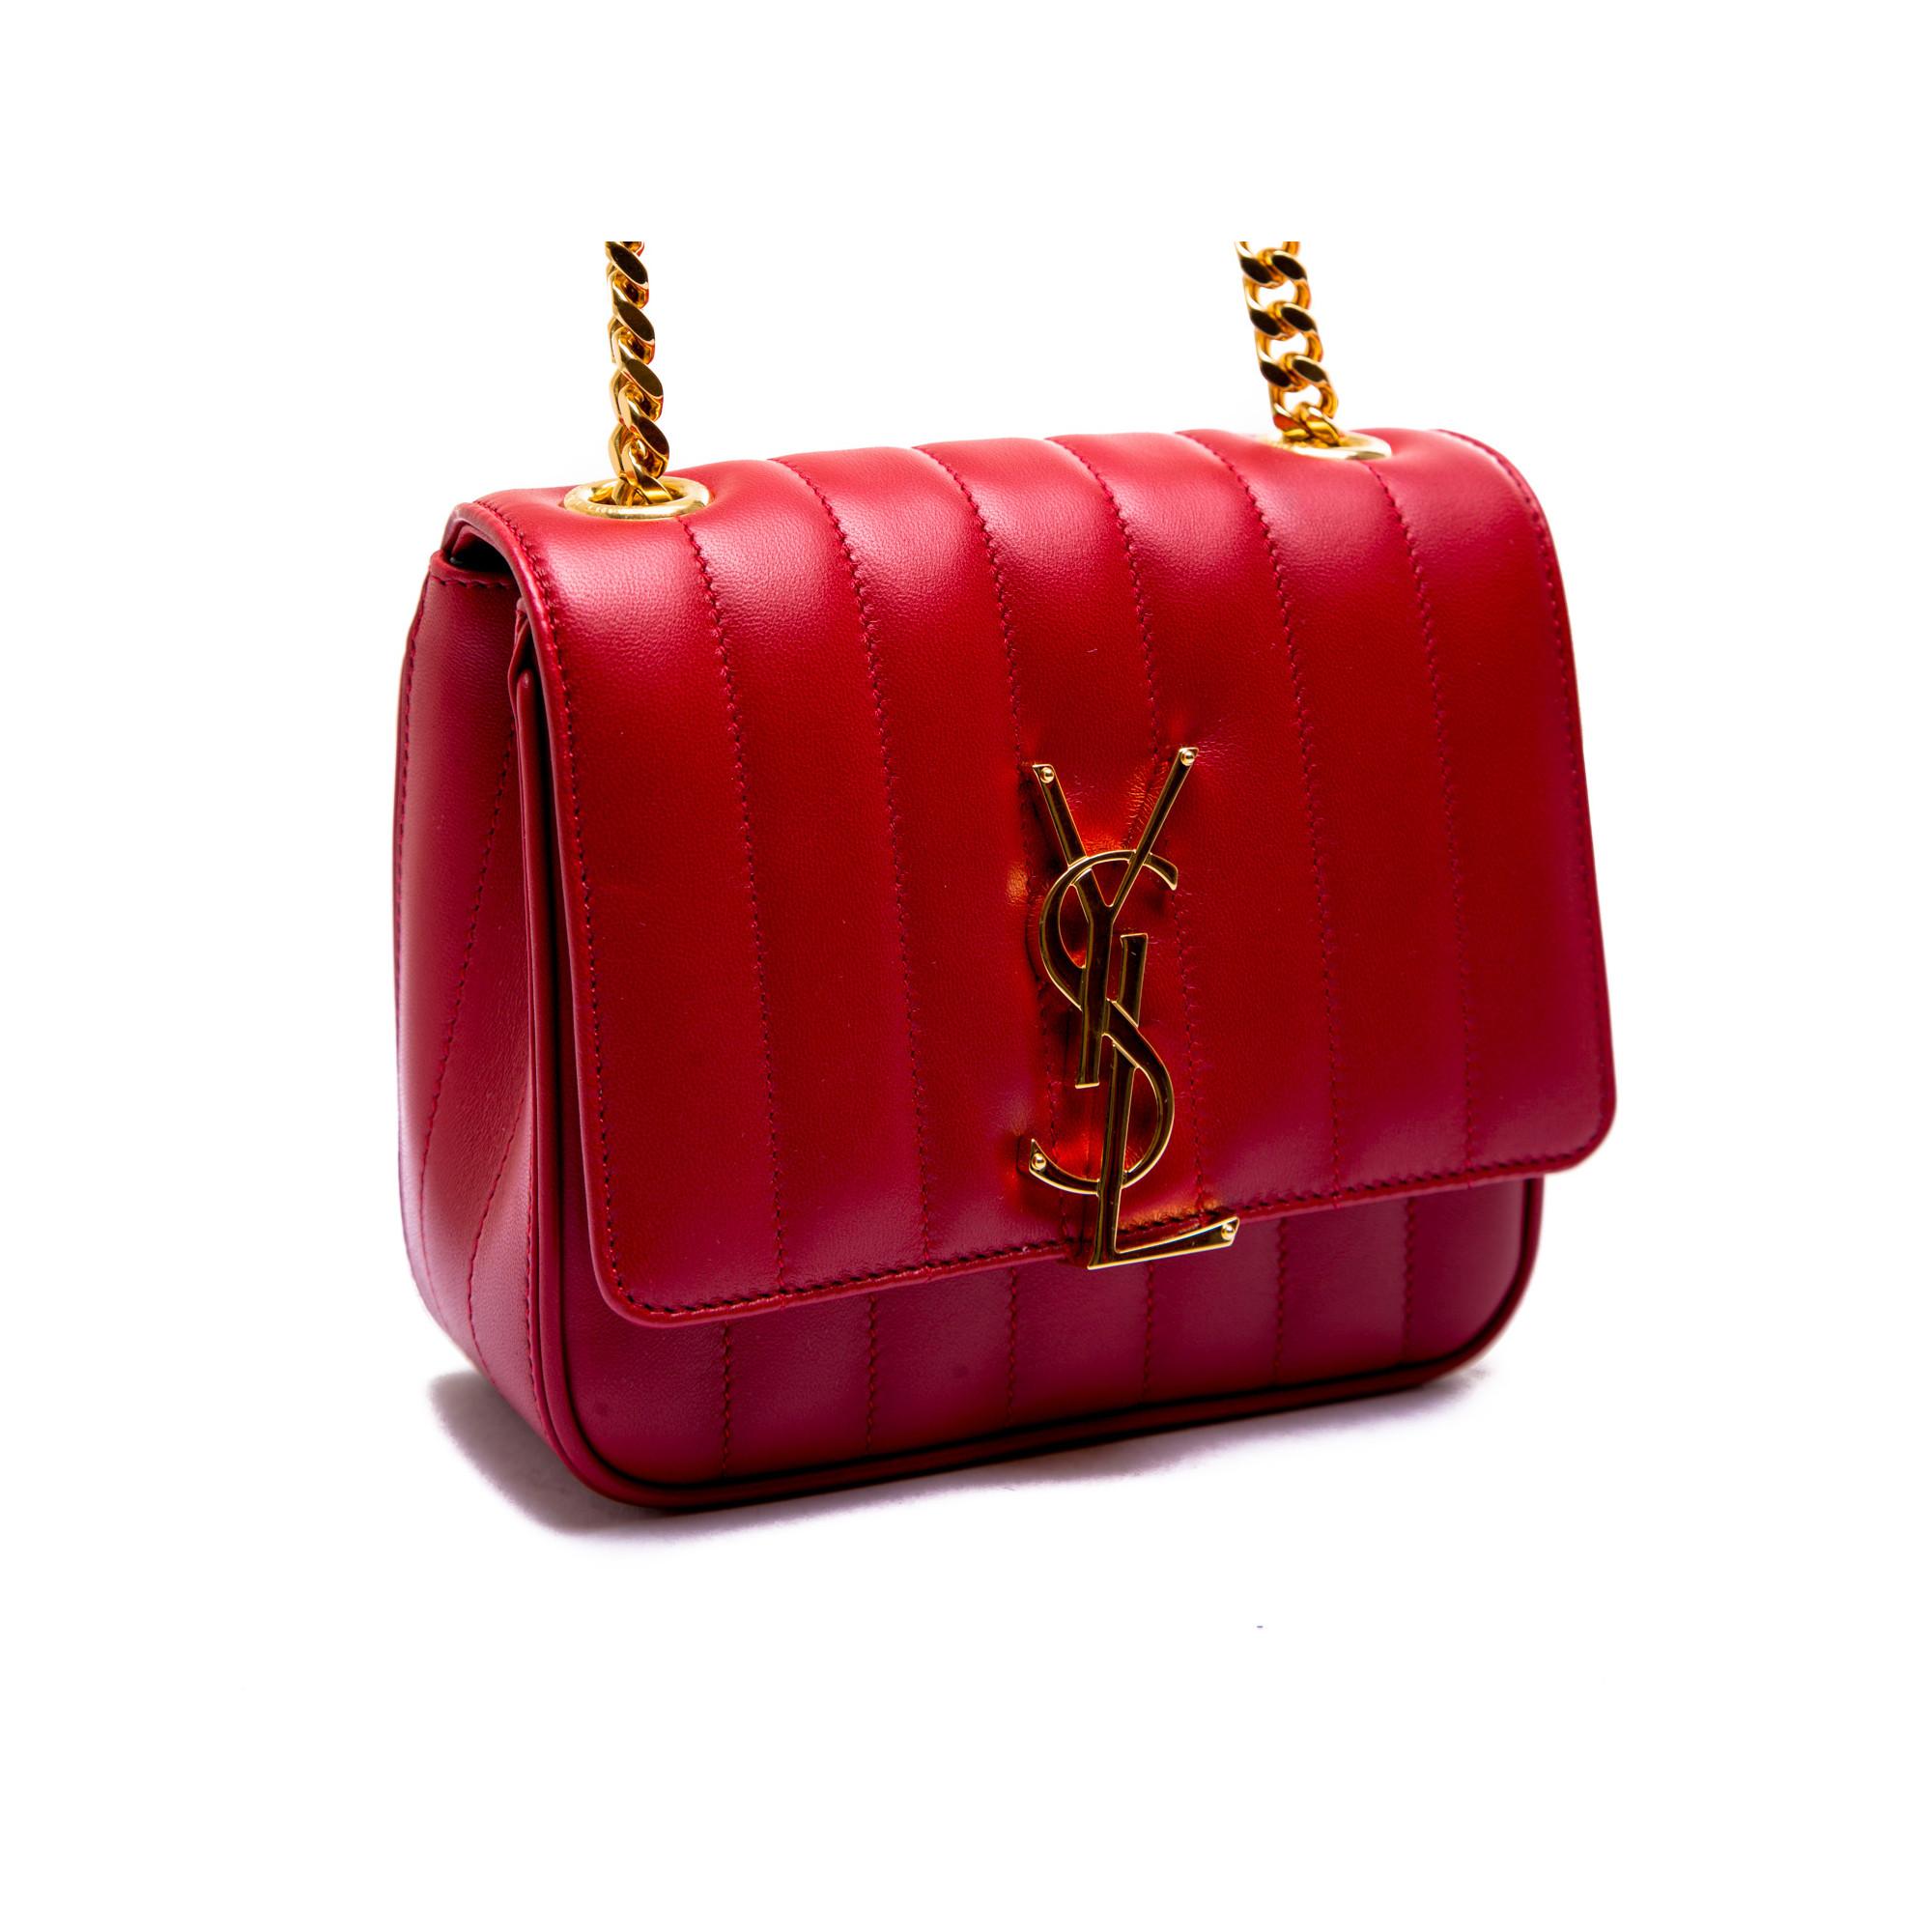 ... Saint Laurent ysl bag mng vicky s red Saint Laurent ysl bag mng vicky s  red b4bc8bd265ada